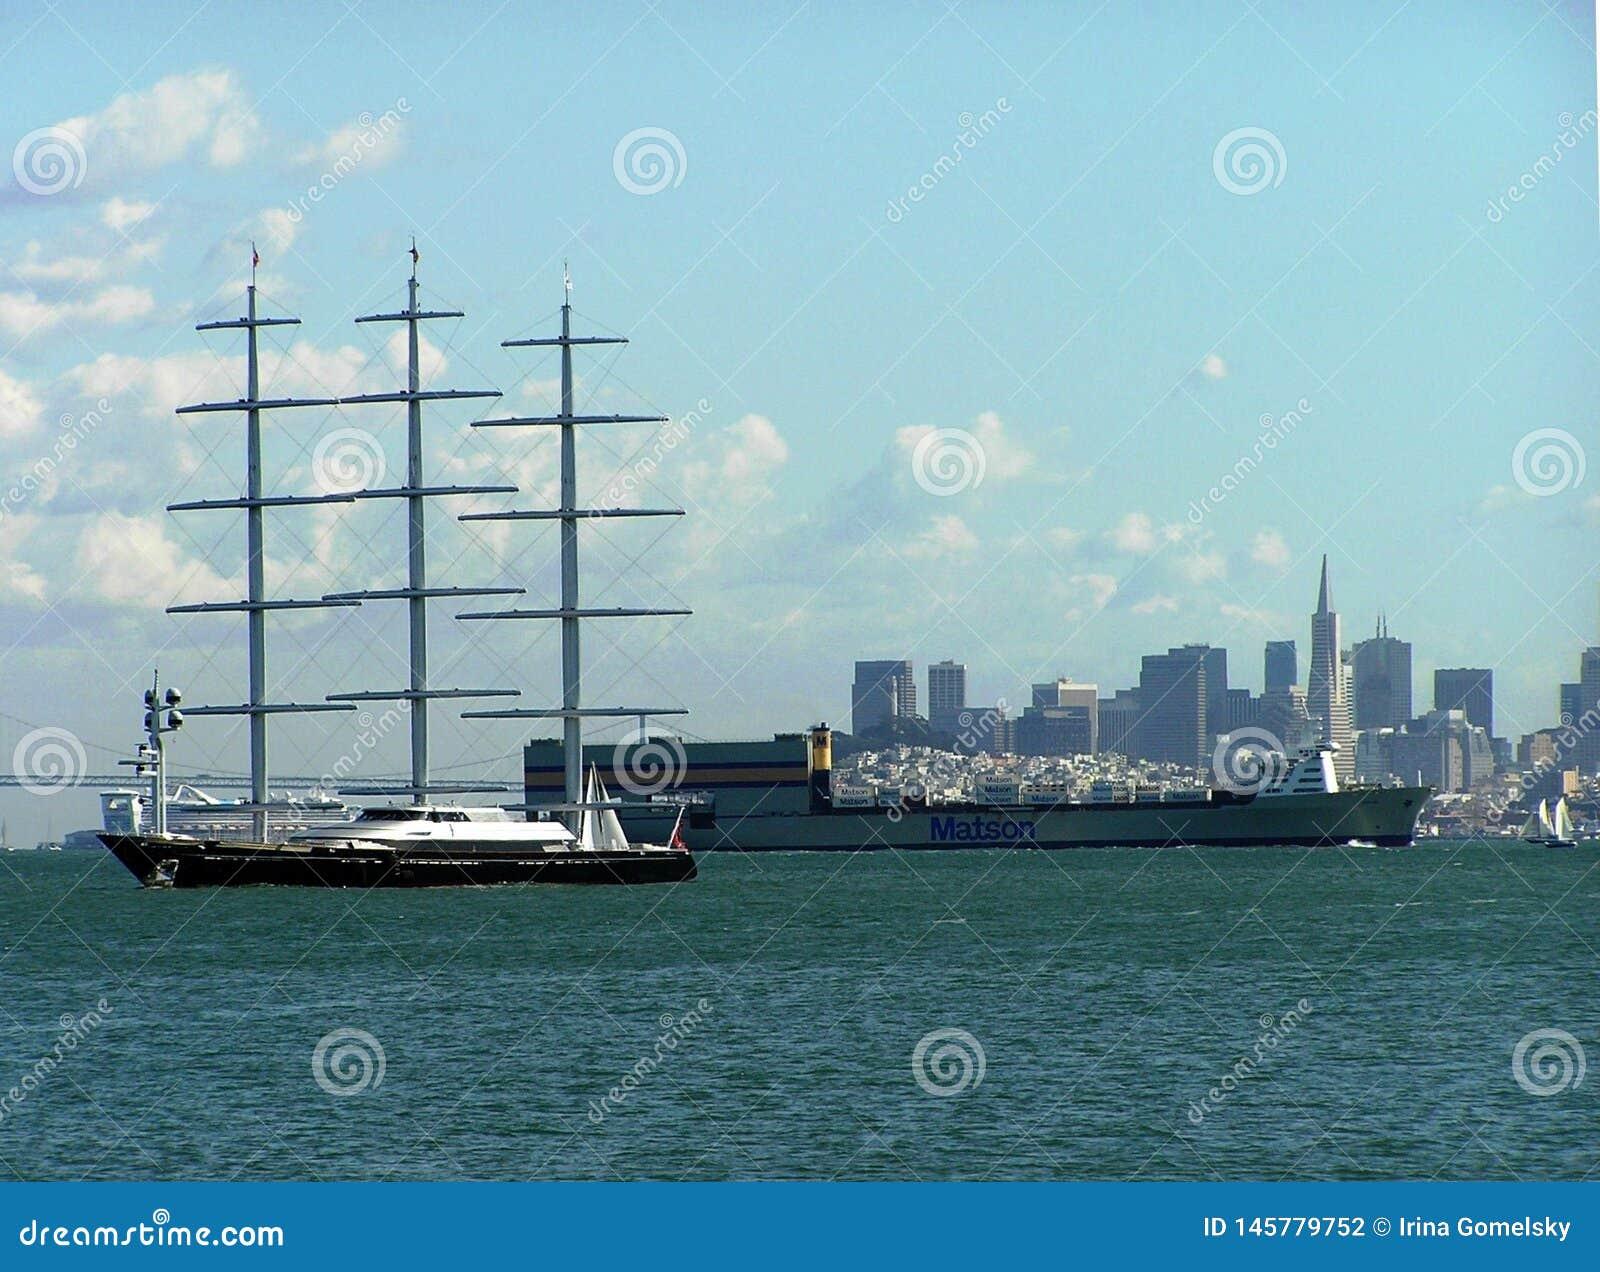 Sailing yacht Maltese Falcon off the coast of San Francisco, USA